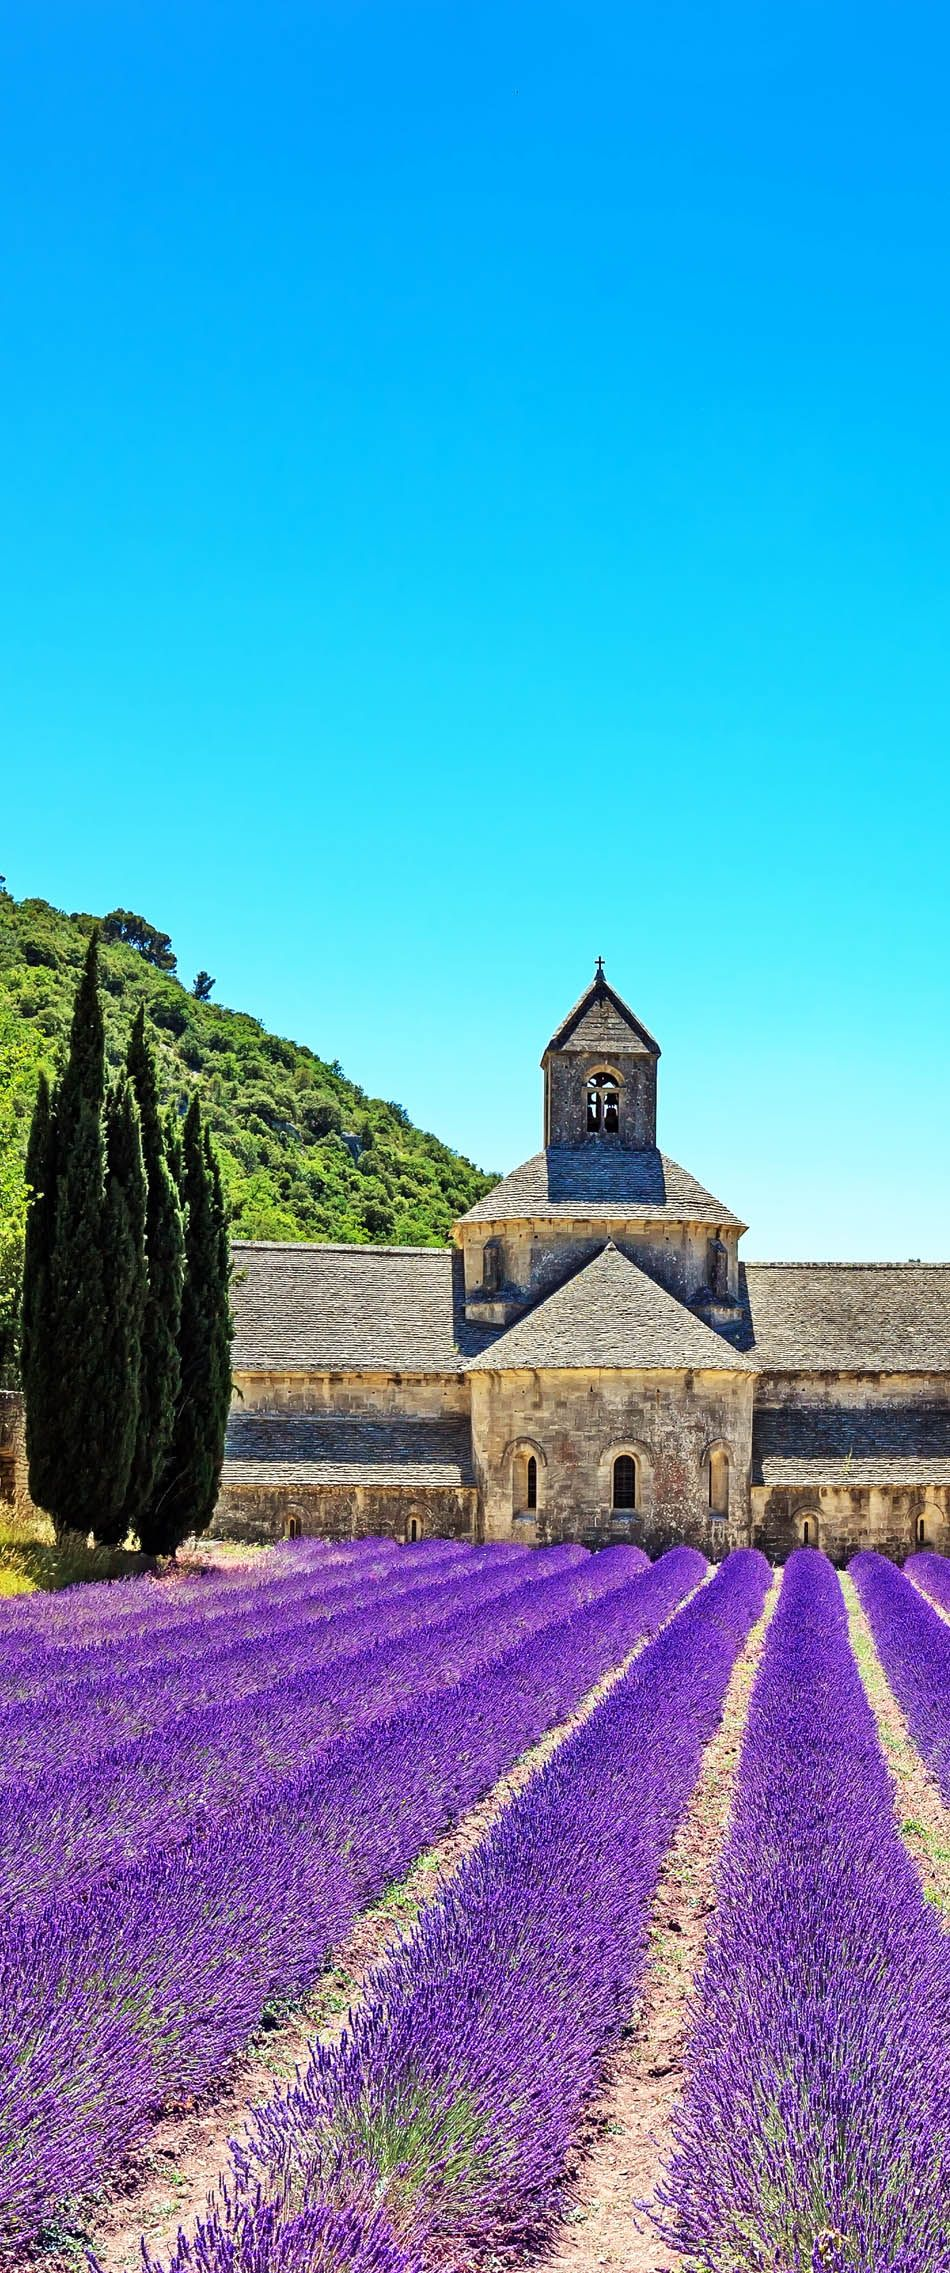 Abdij van Senanque en lavendel velden. Gordes, Luberon, Vaucluse, Provence, Frankrijk